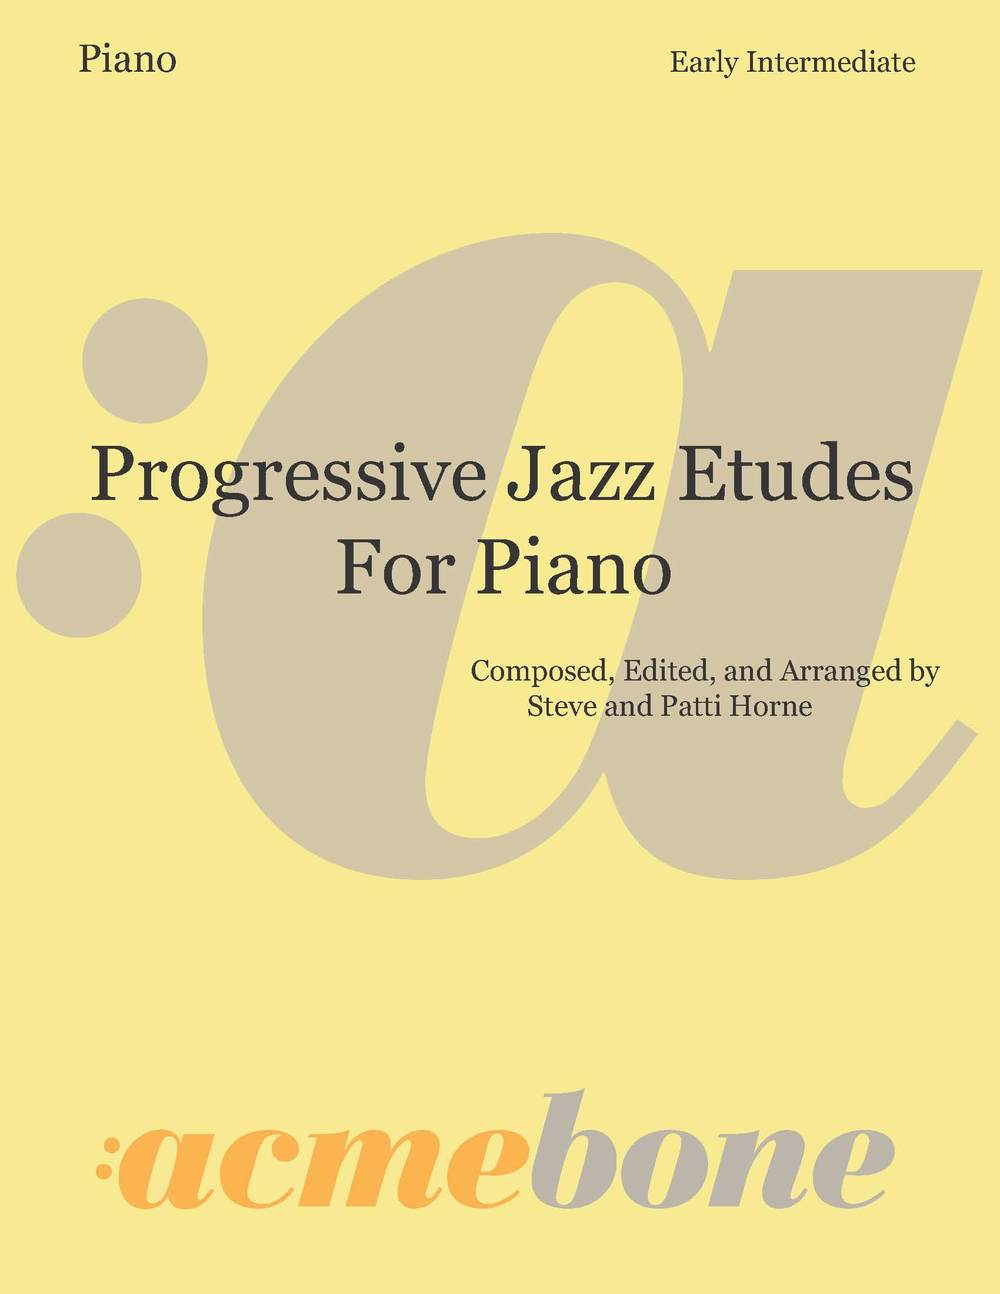 Piano Etudes_cover_bk1.jpg